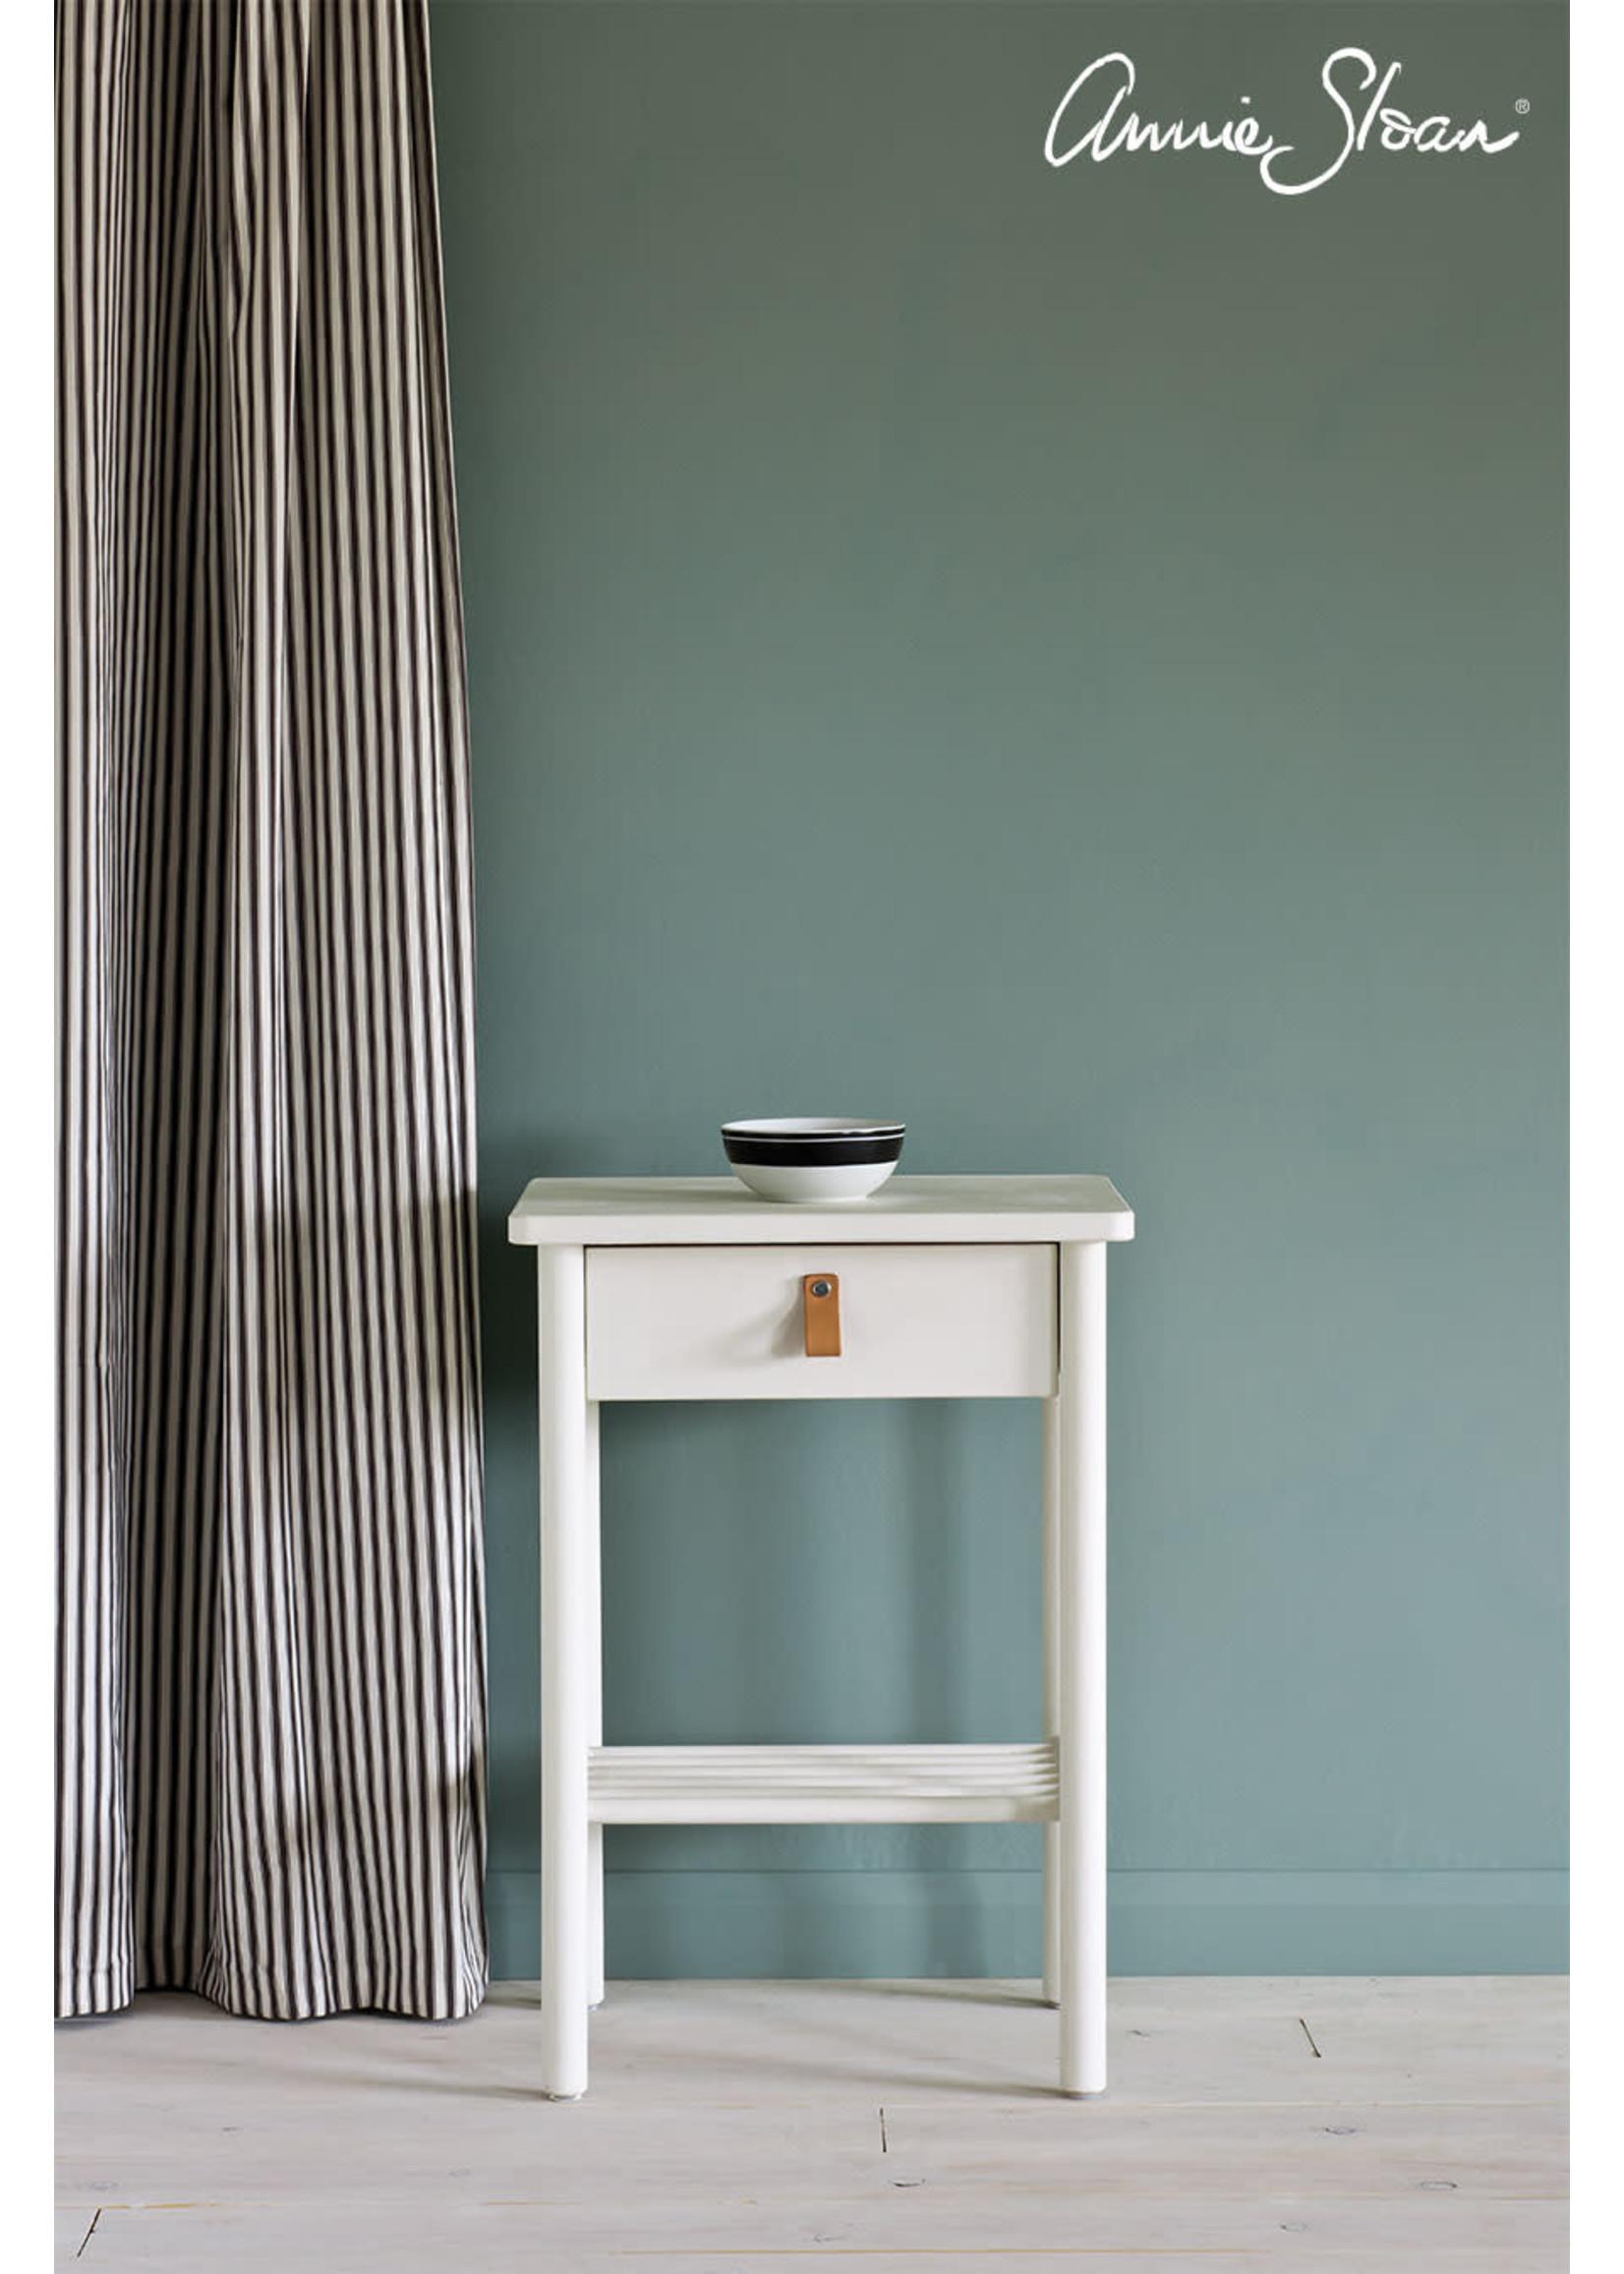 Annie Sloan Chalk Paint® Old White Annie Sloan Chalk Paint ®